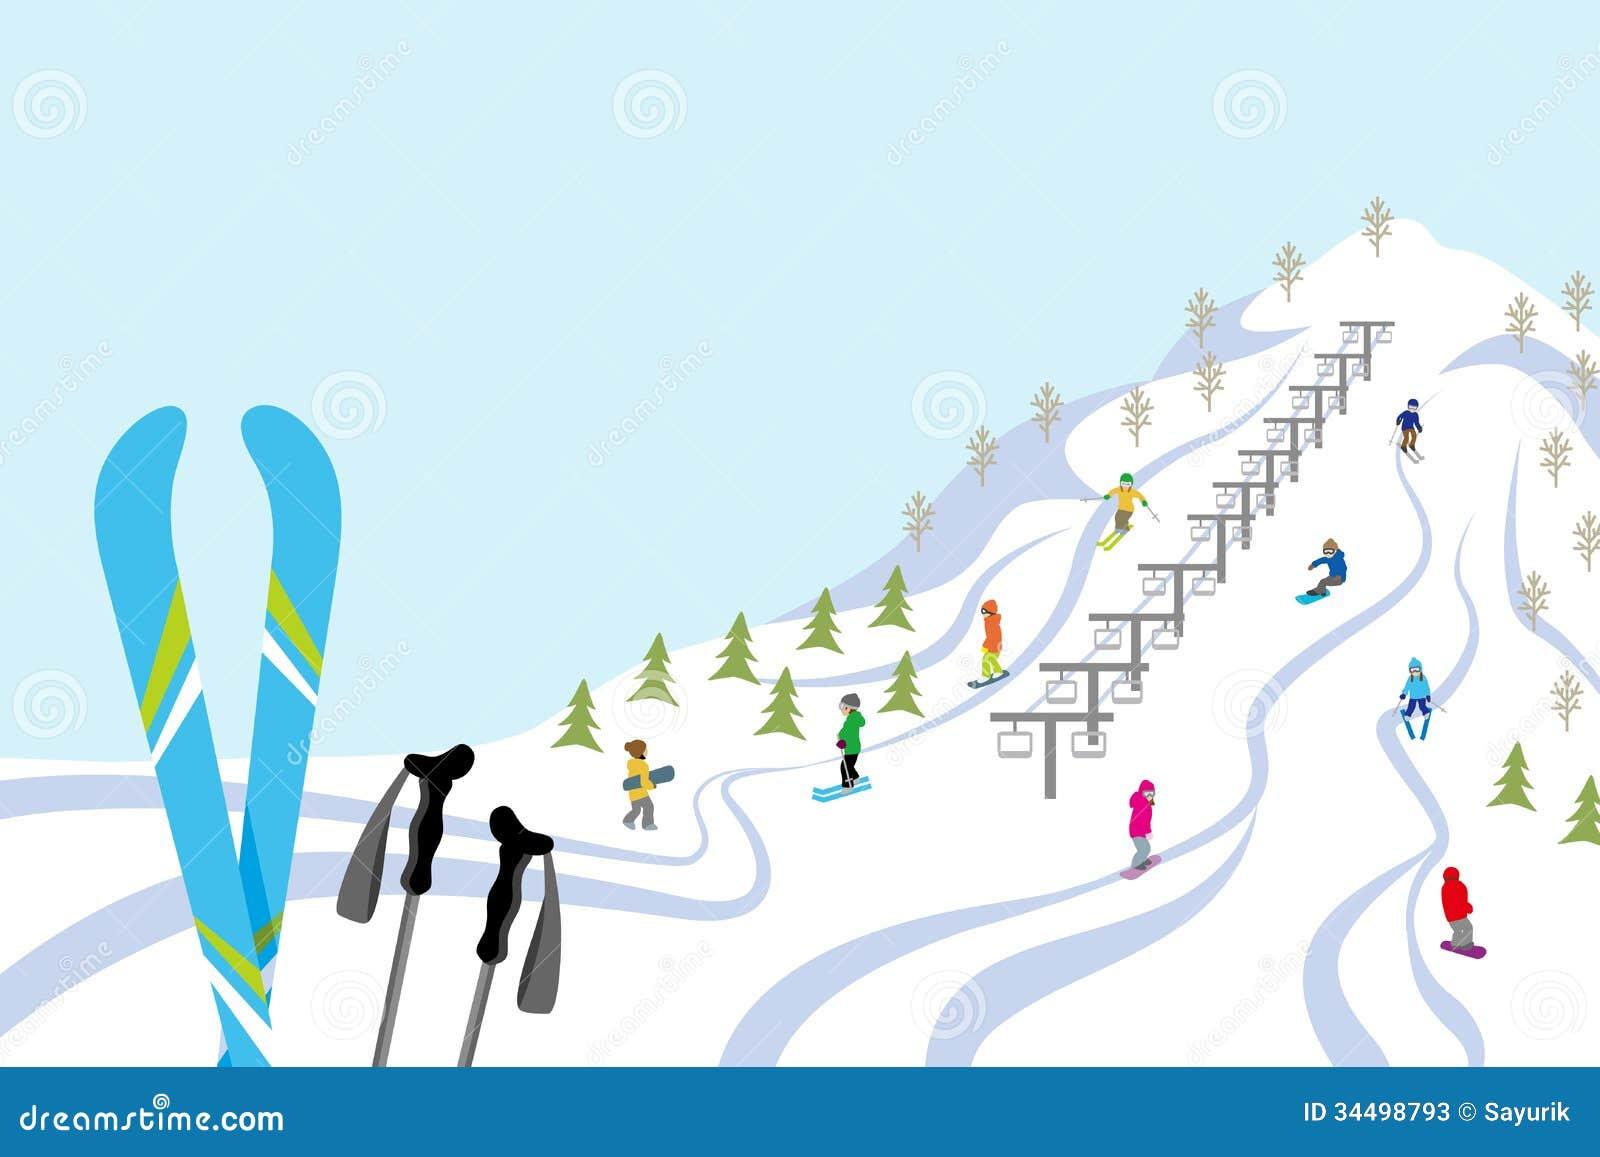 Ski Slope, Horizontal Stock Photos - Image: 34498793